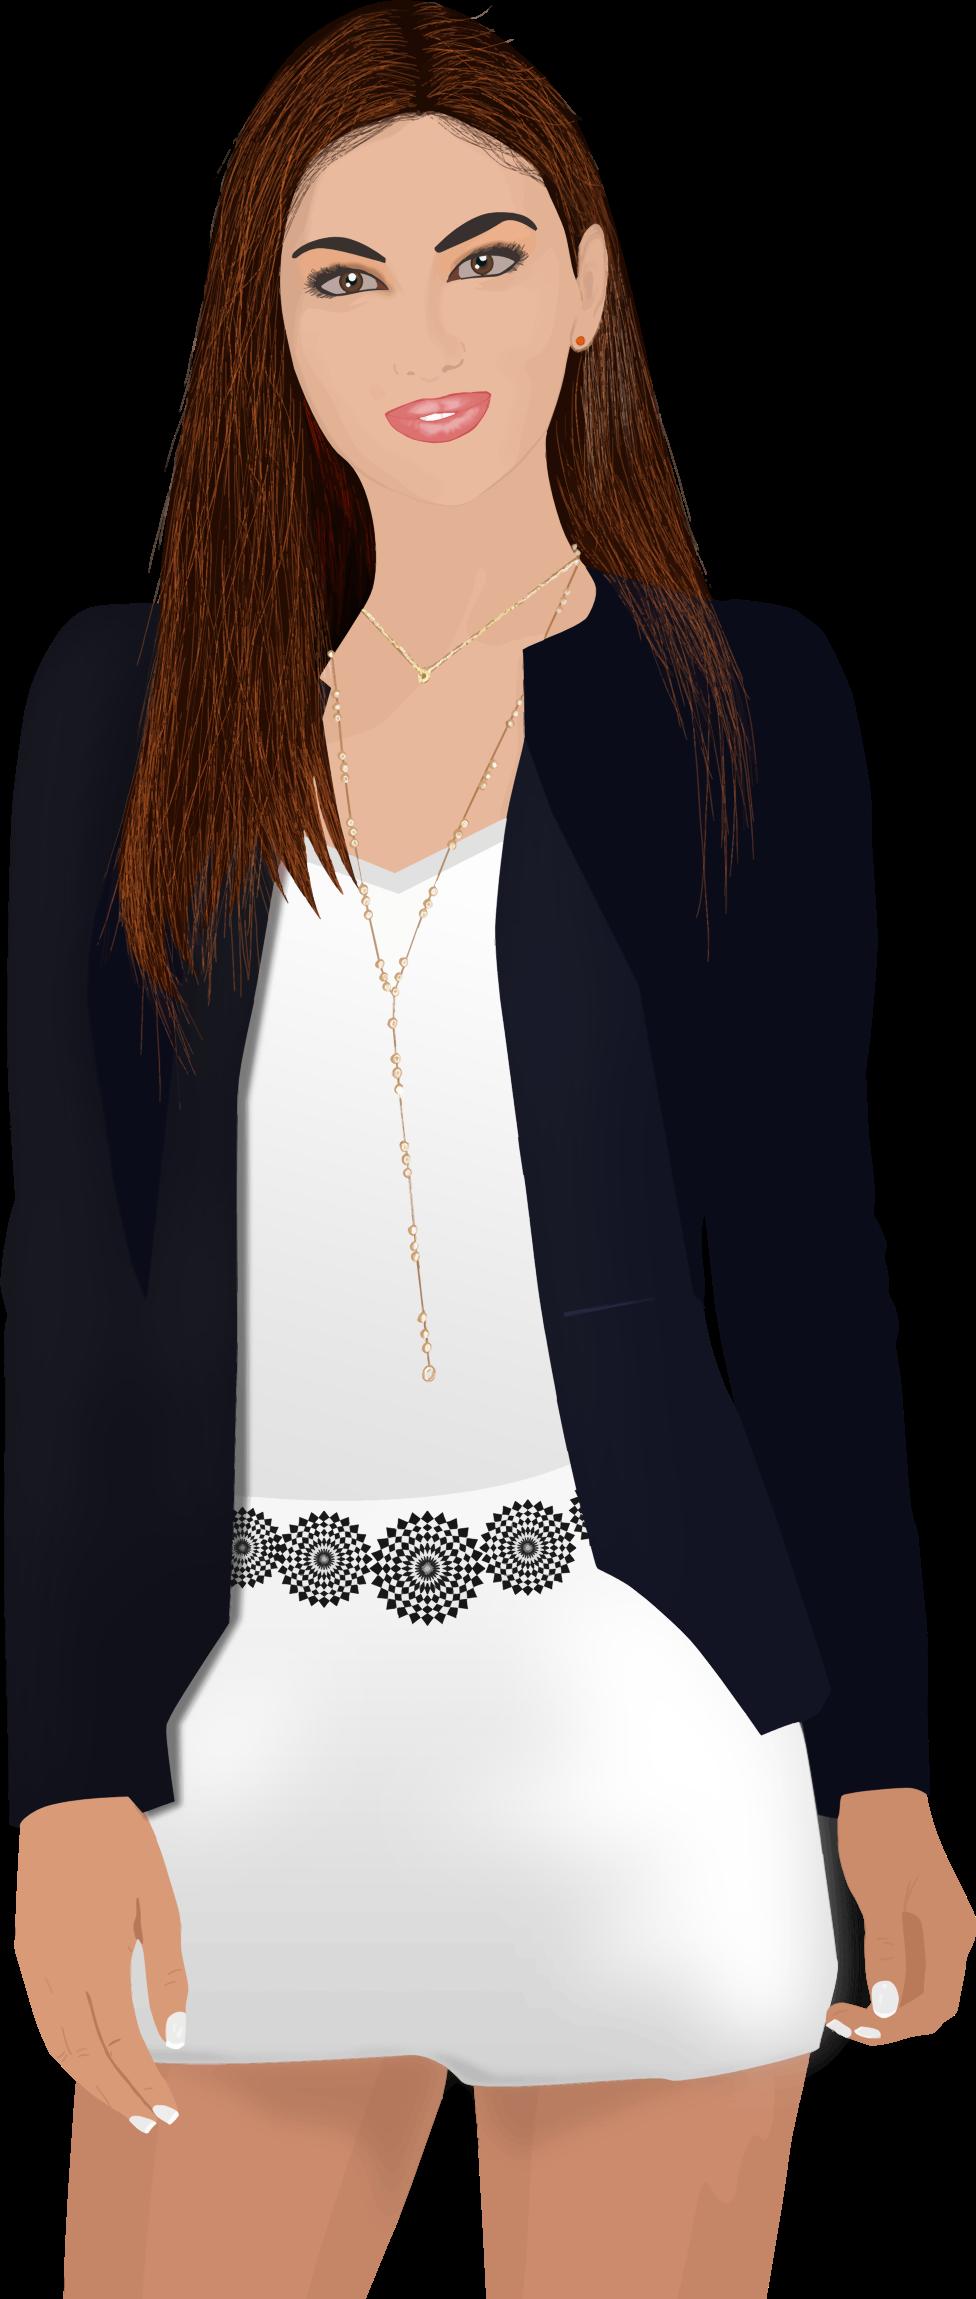 Business woman portrait trace. Professional clipart buisness